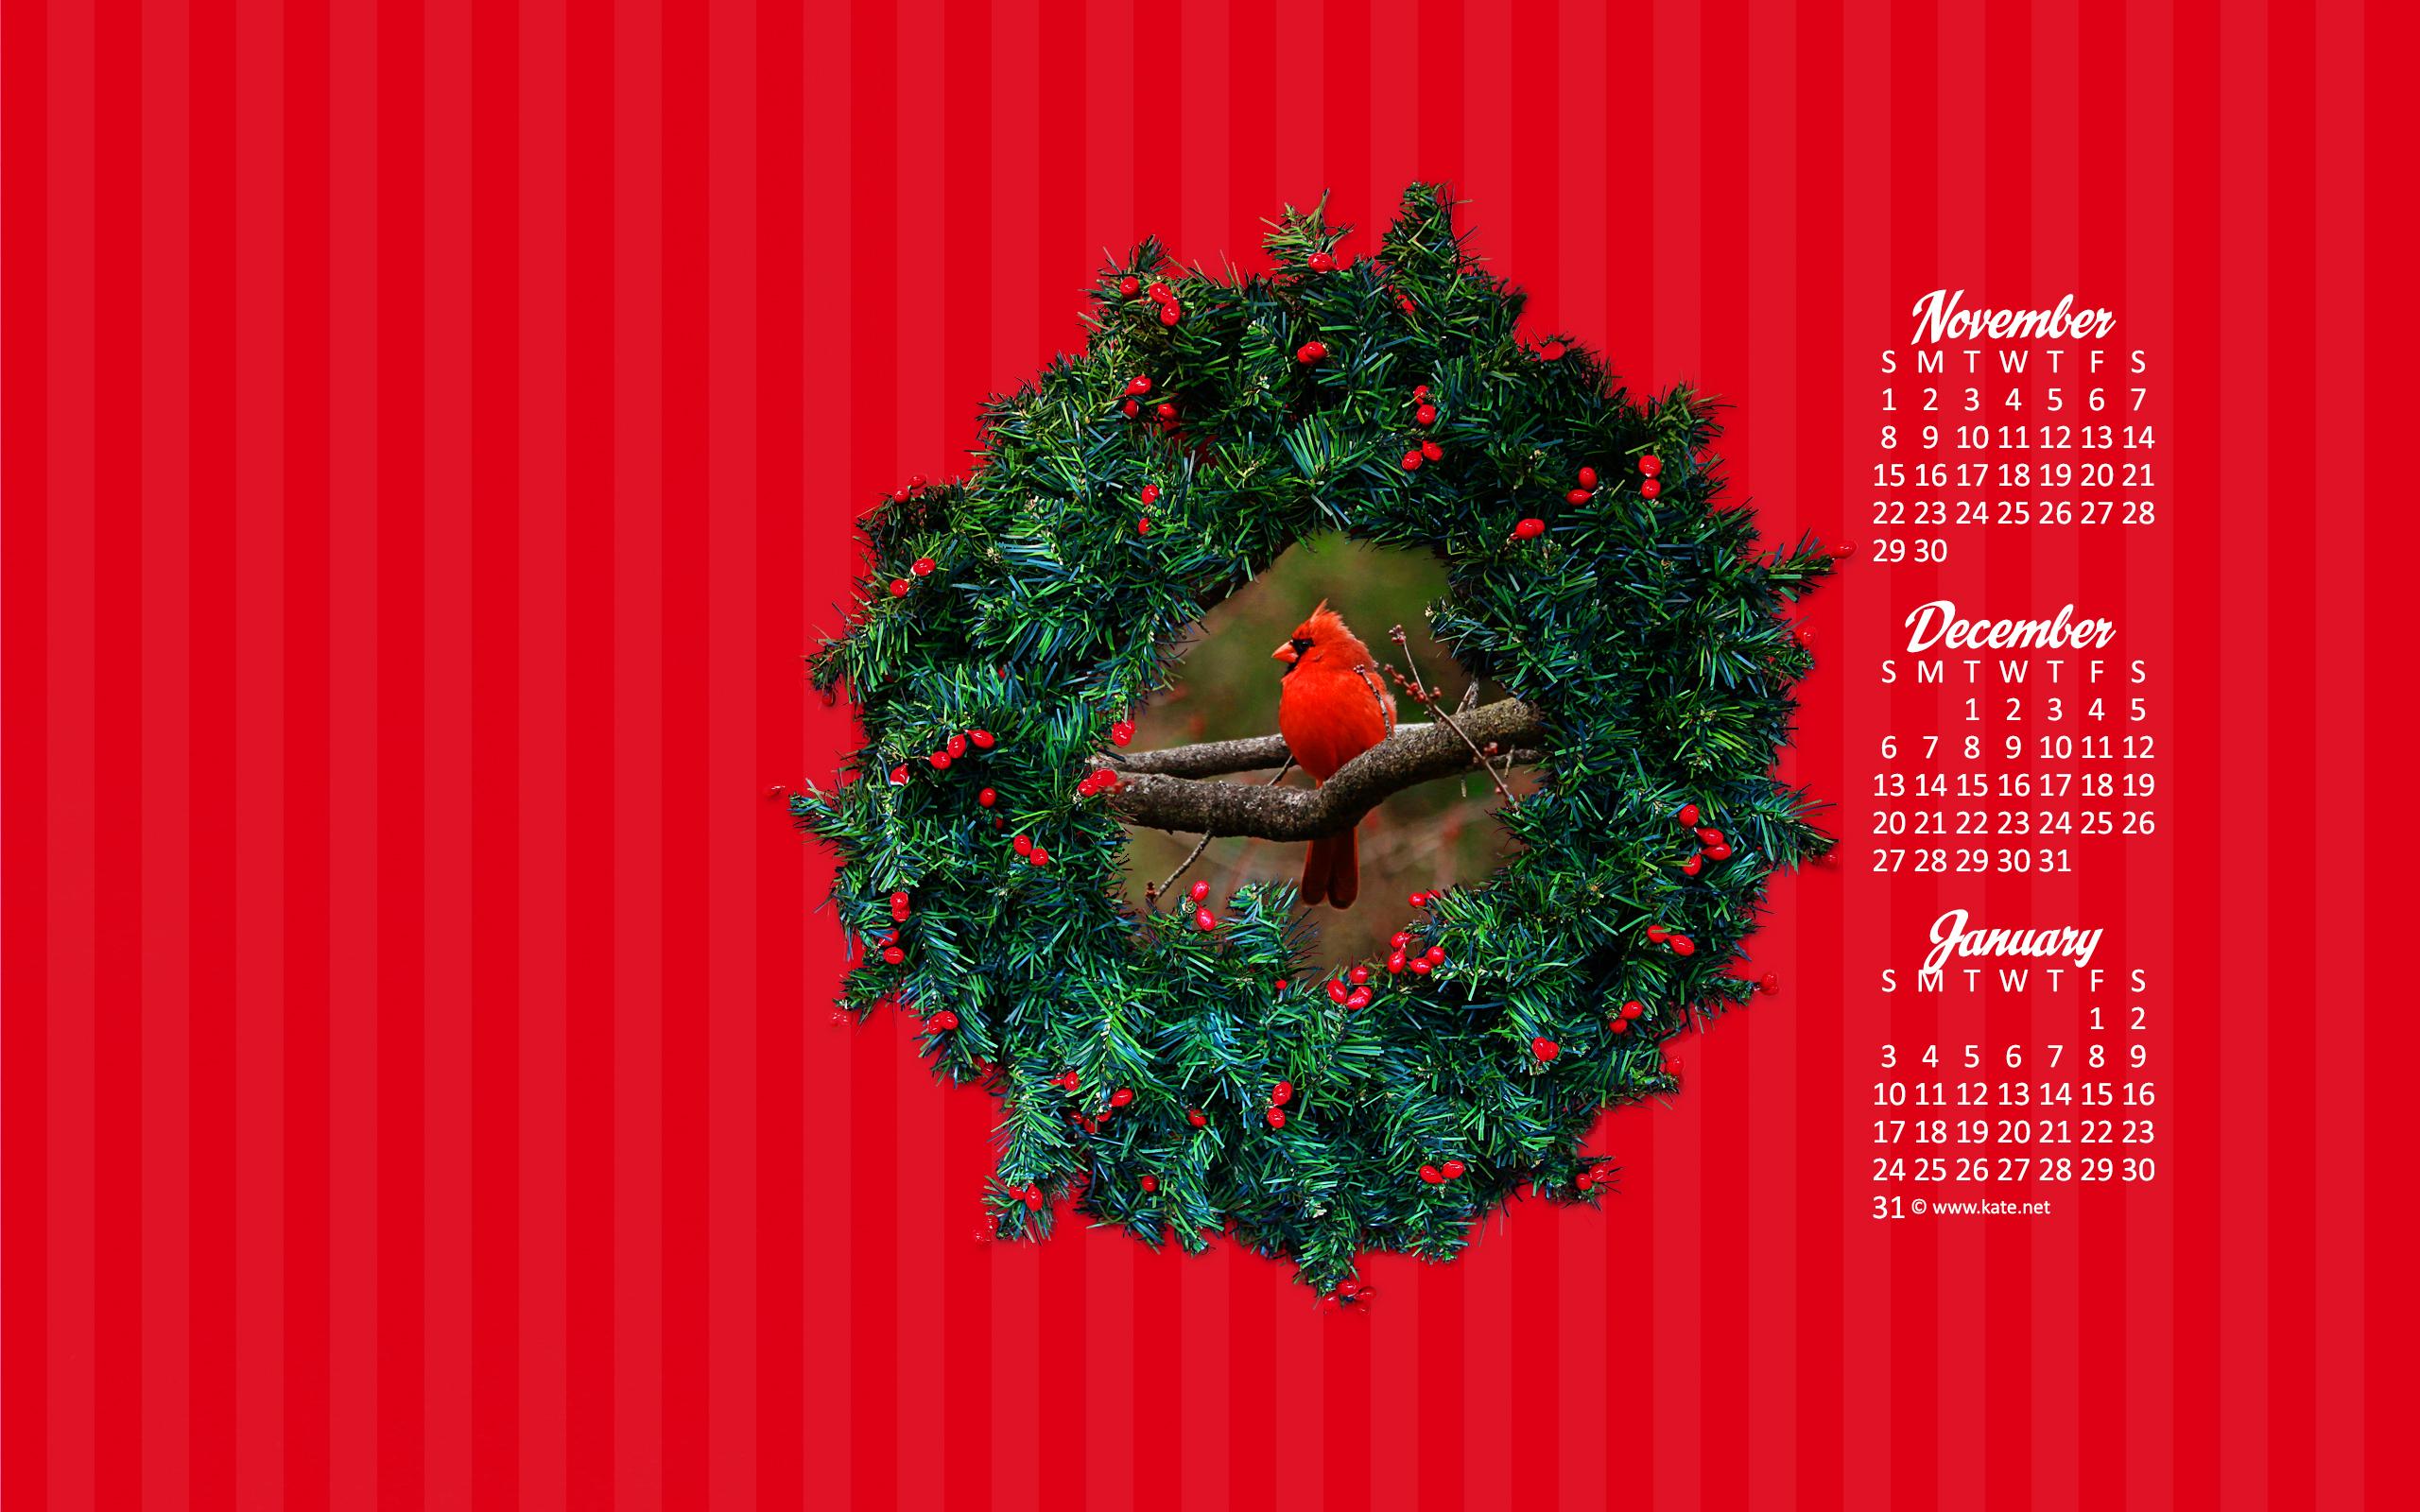 Calendar Wallpapers Desktop Wallpapers by Katenet 2560x1600